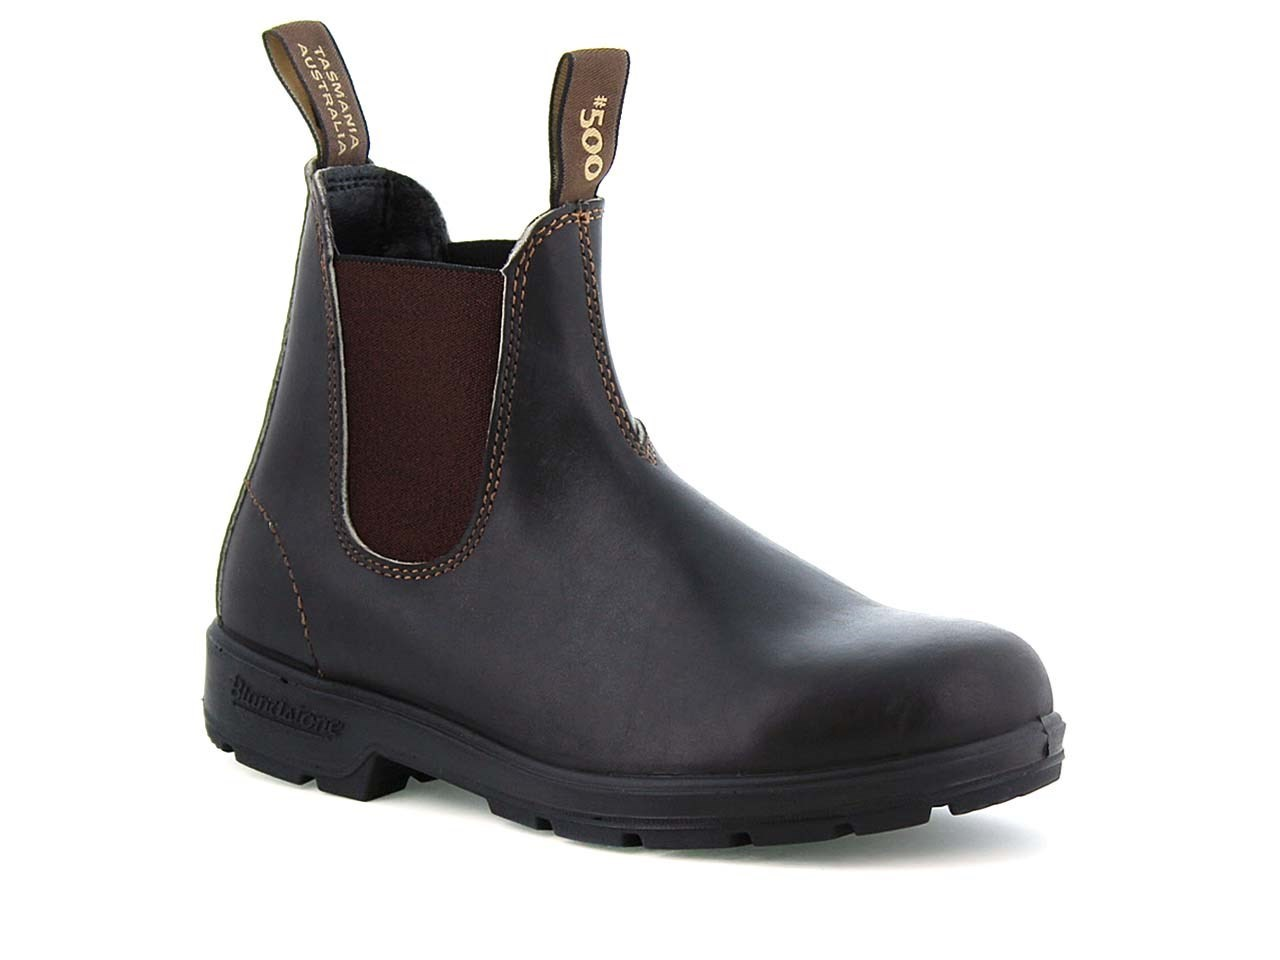 blundstone skor rea